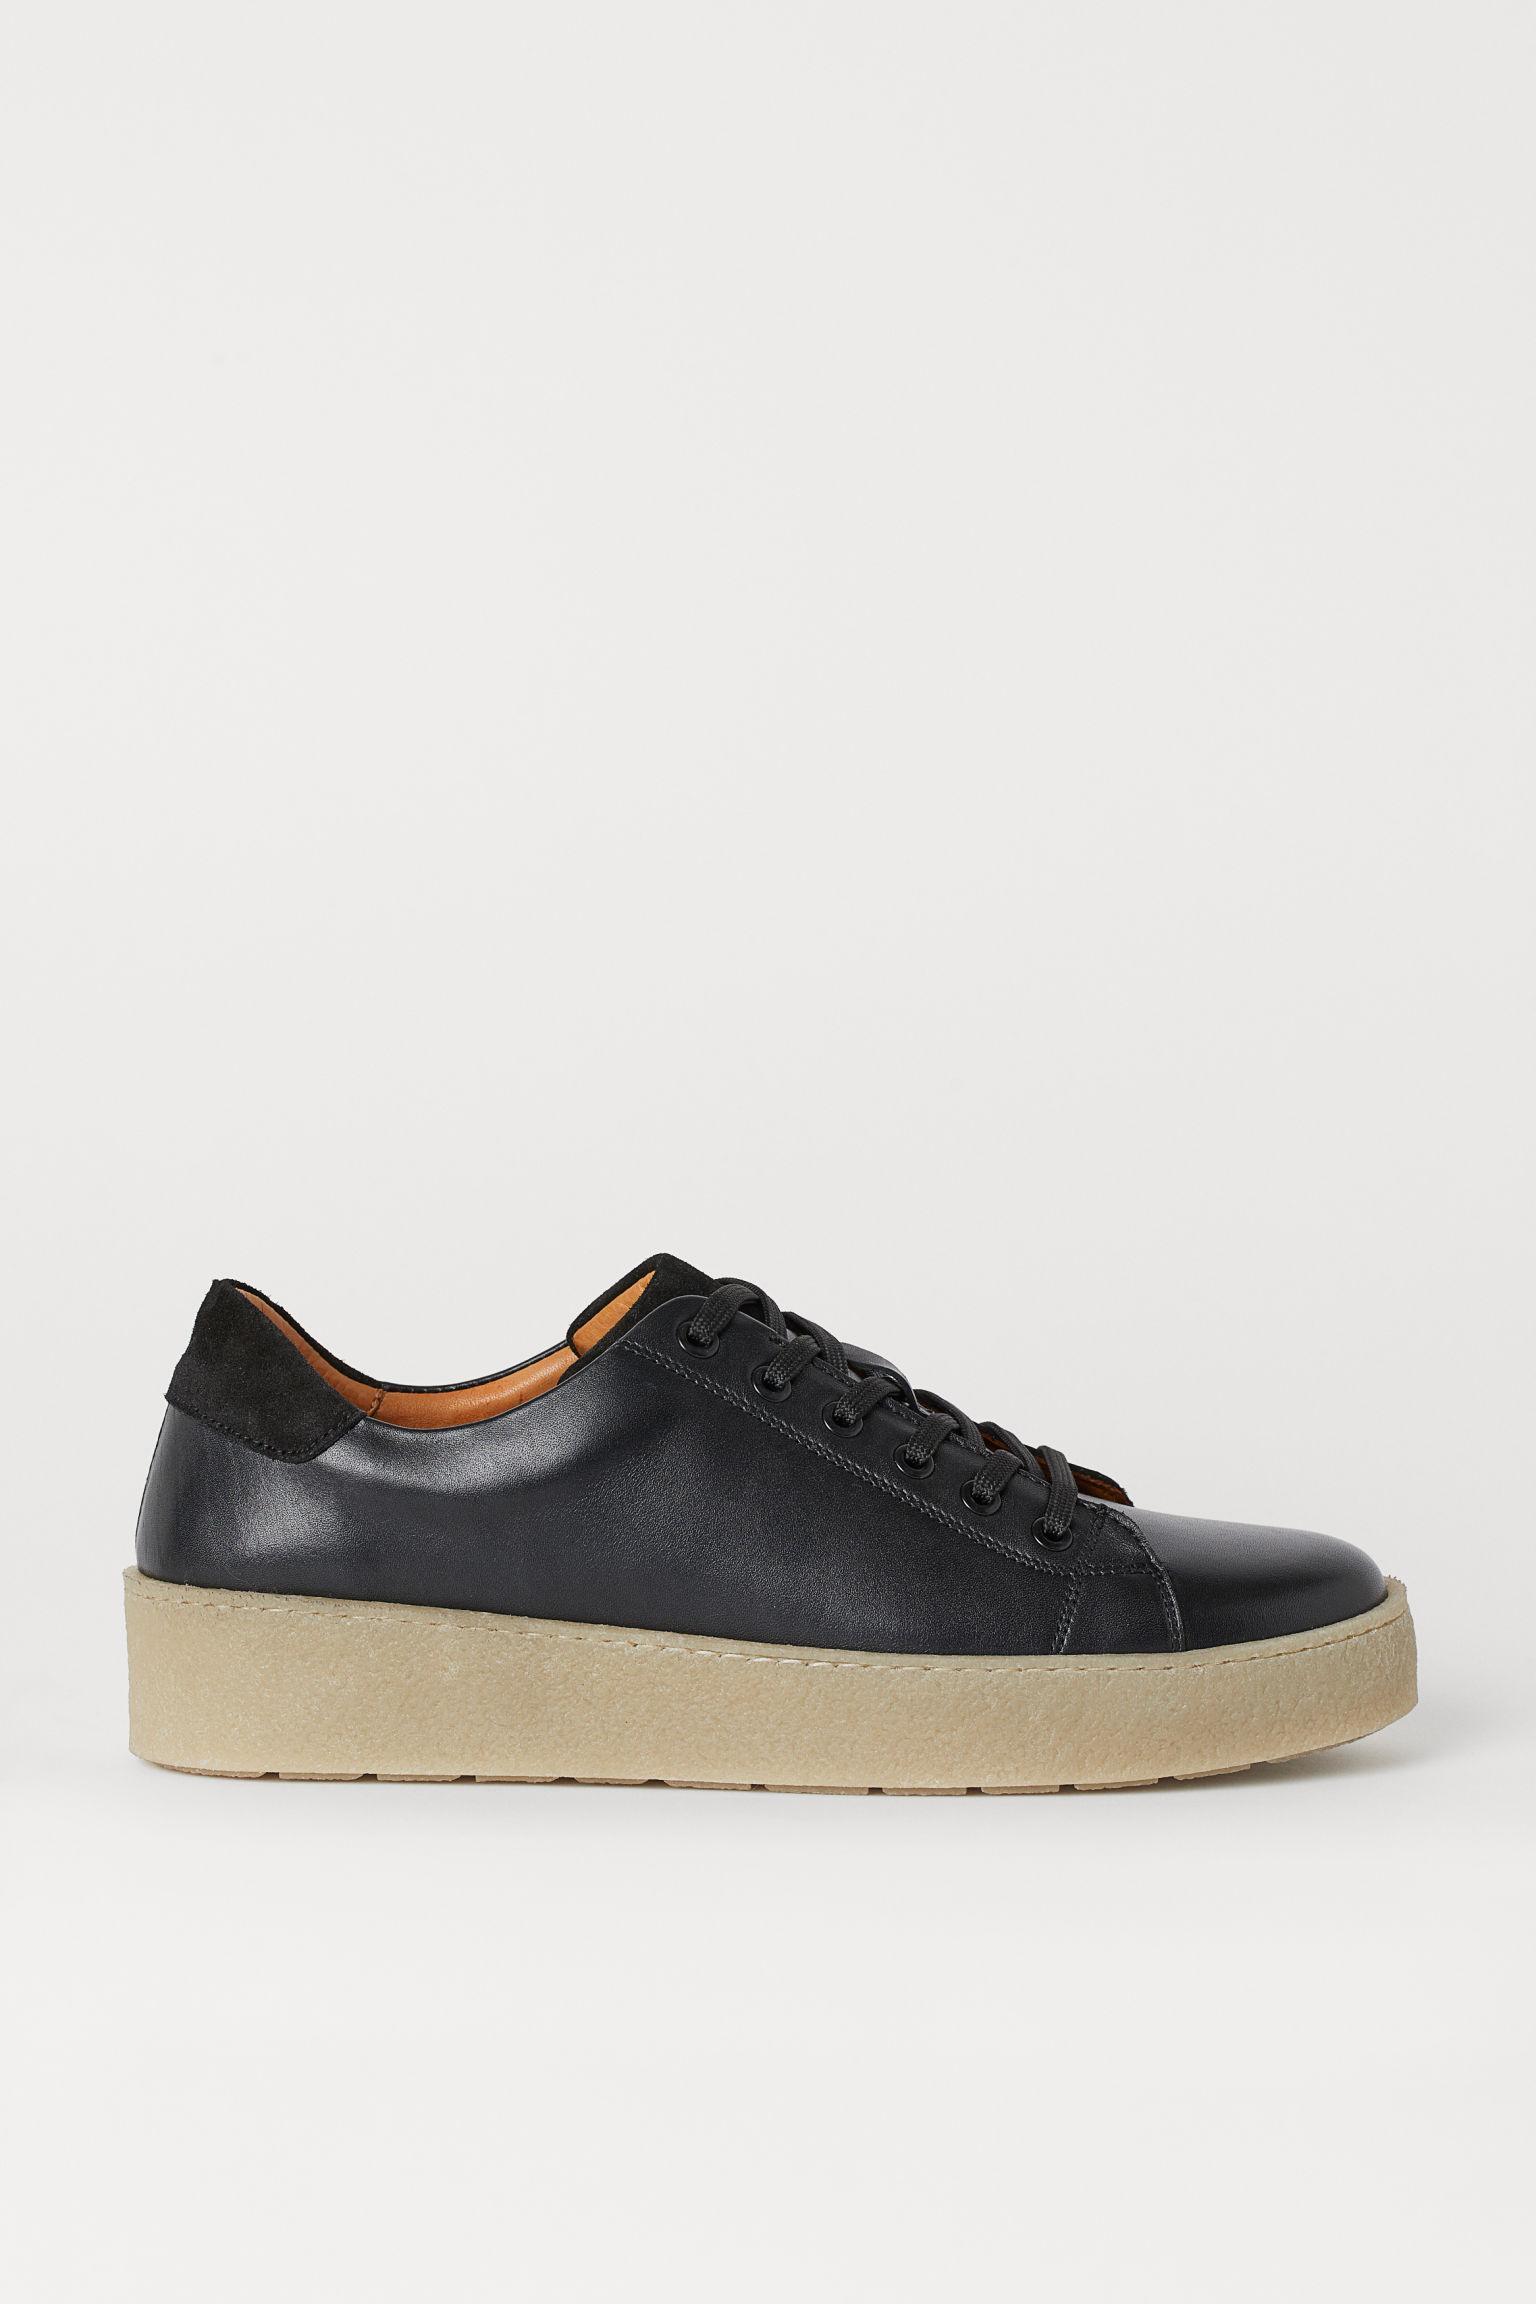 Отзыв на Ledersneaker из Интернет-Магазина H&M